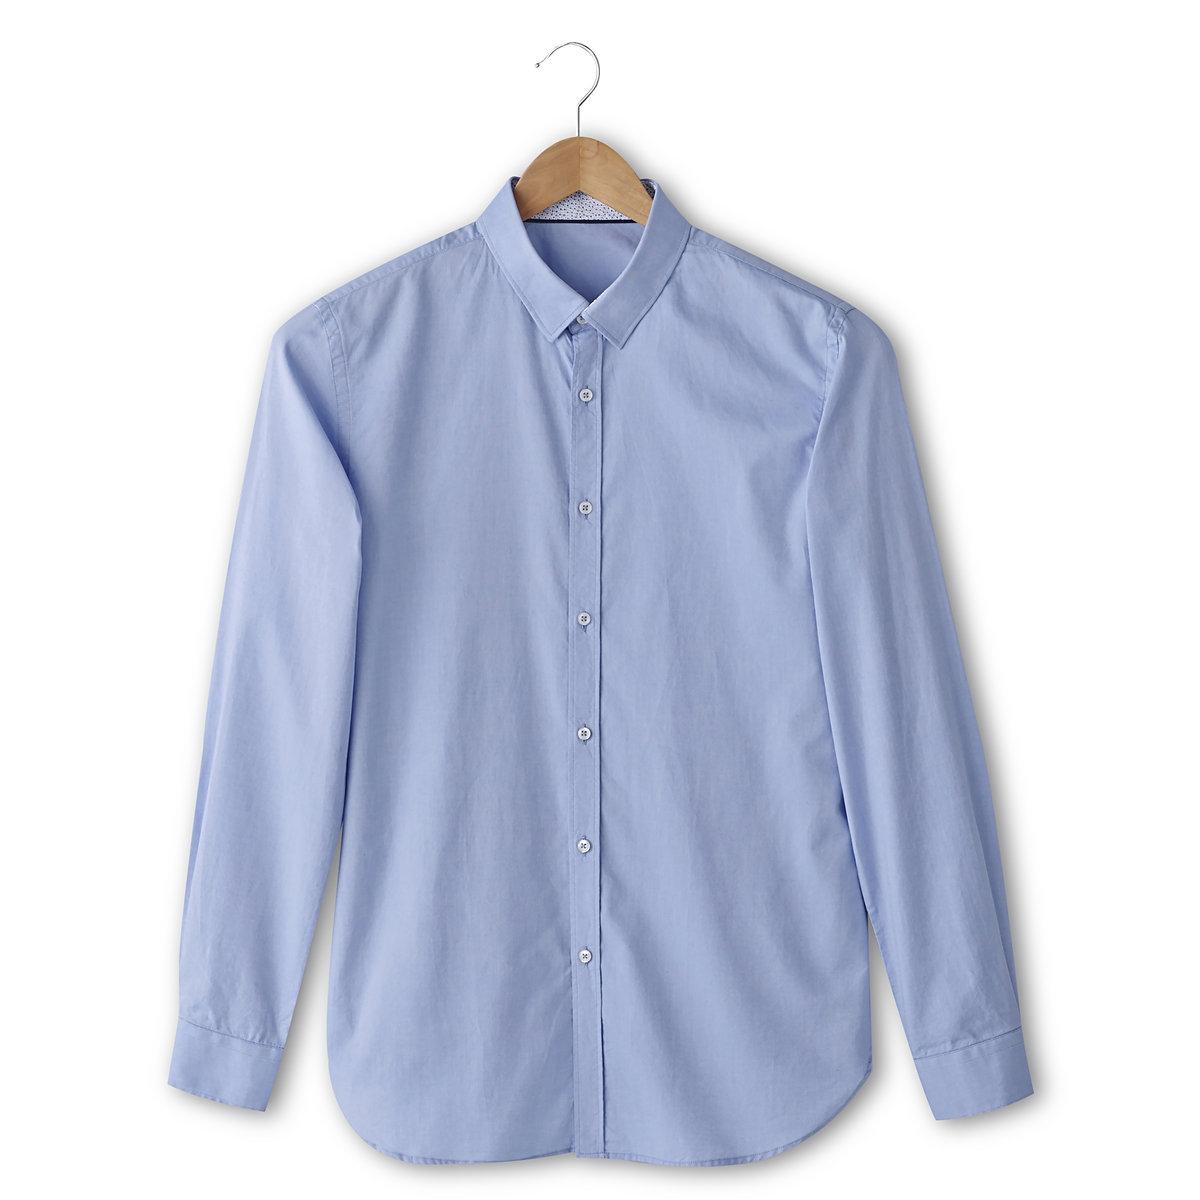 Рубашка-оксфорд, 100% хлопка от La Redoute